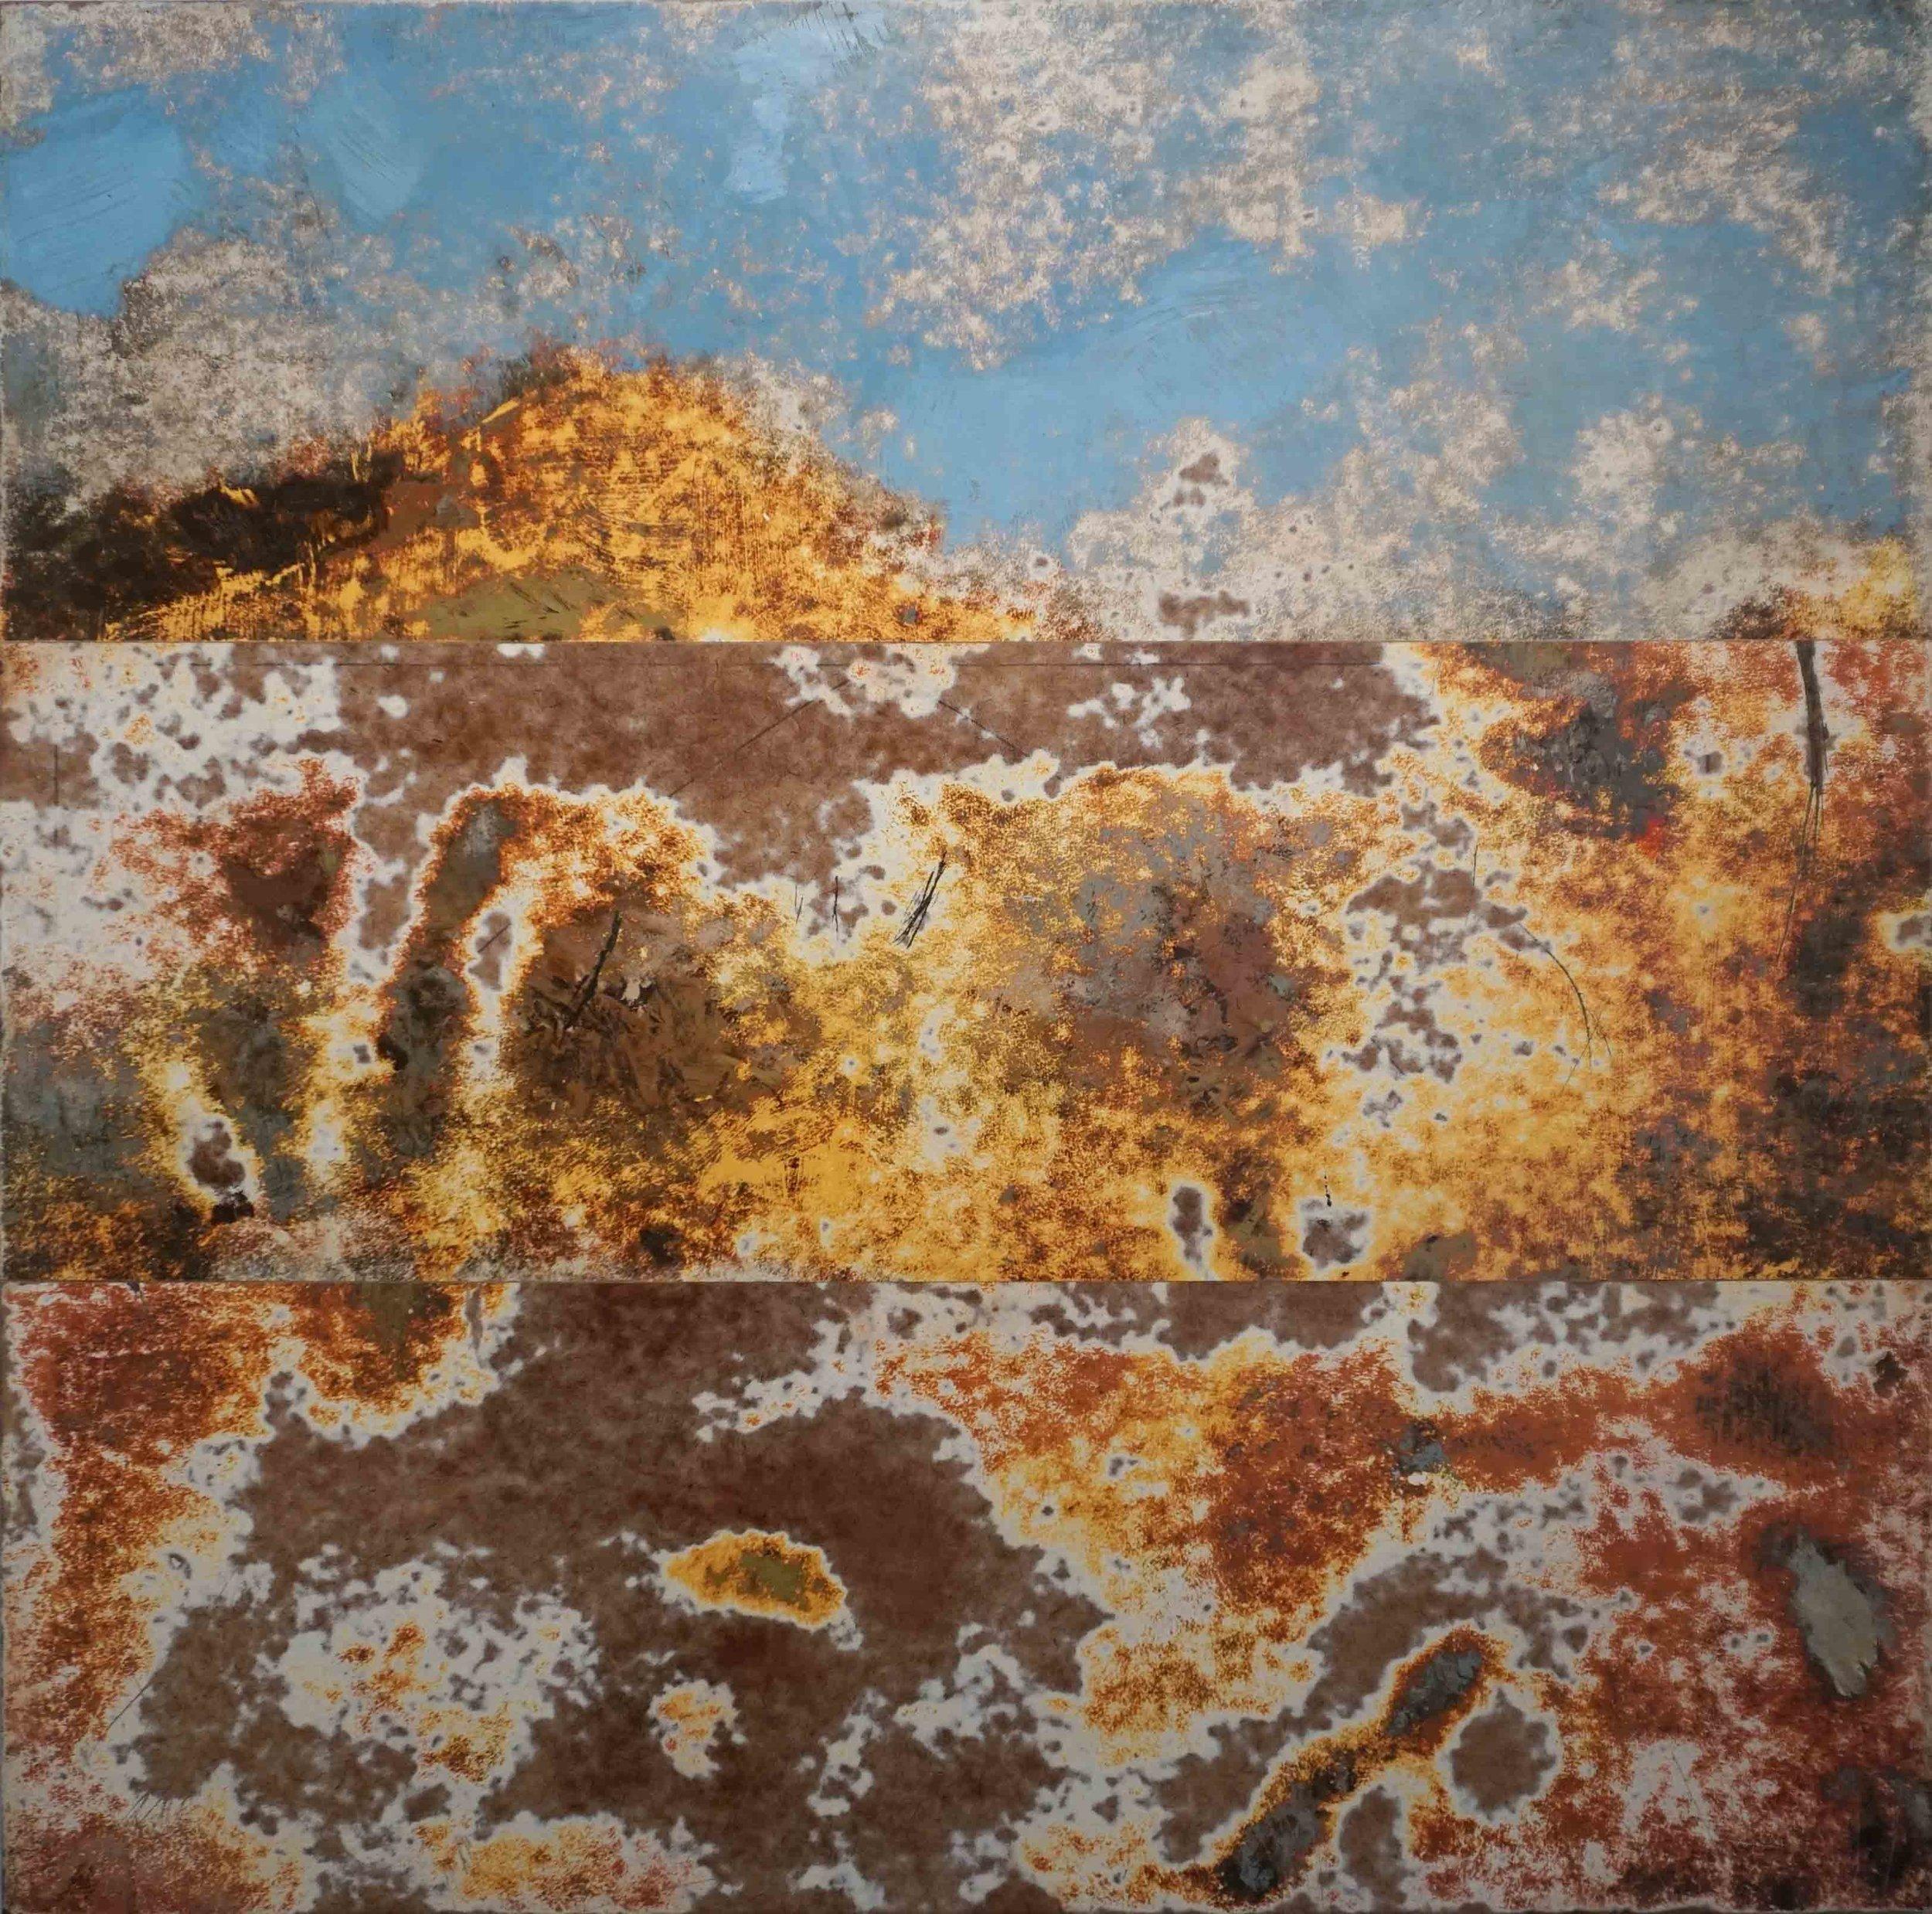 14. Merrick Belyea,  Mountain Quarry , 2019, oil on board, 100 x 100 cm. POA